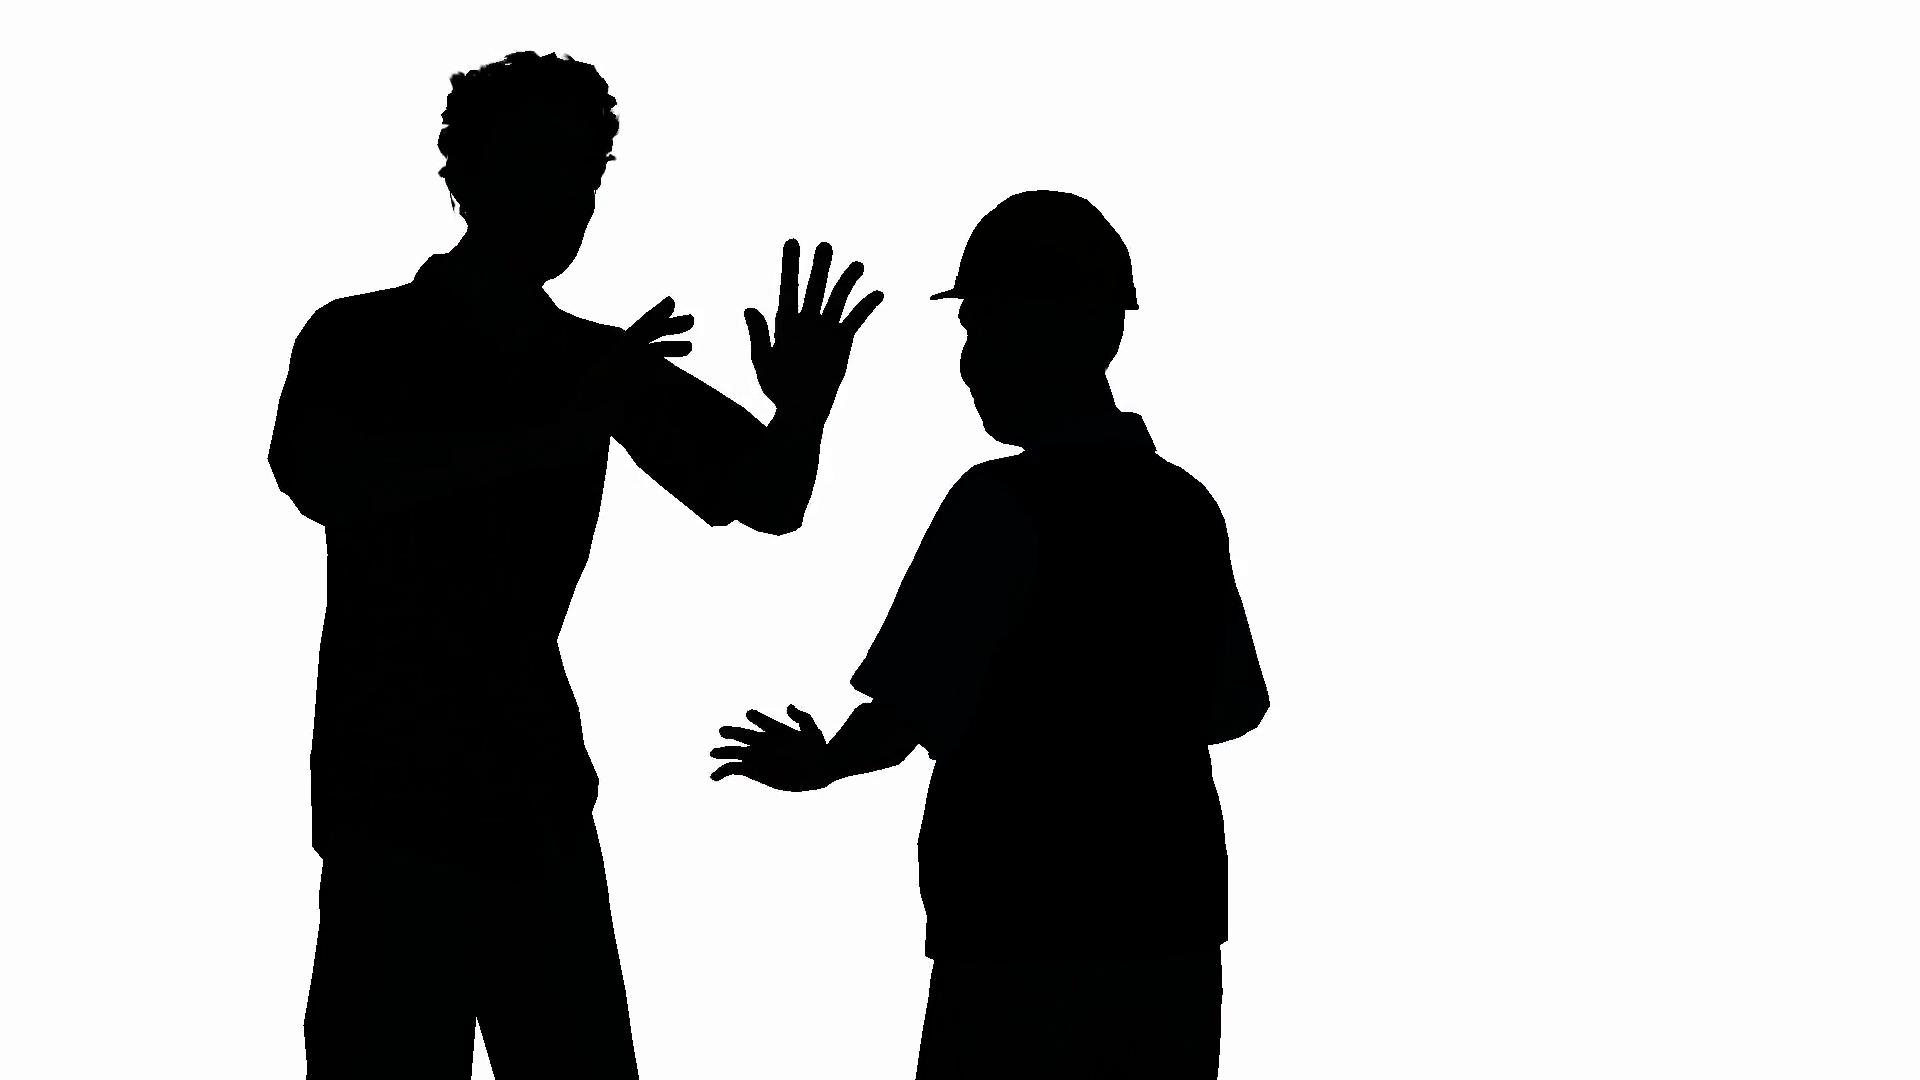 1920x1080 Two Men Arguing In Silhouette Medium Shot Motion Background